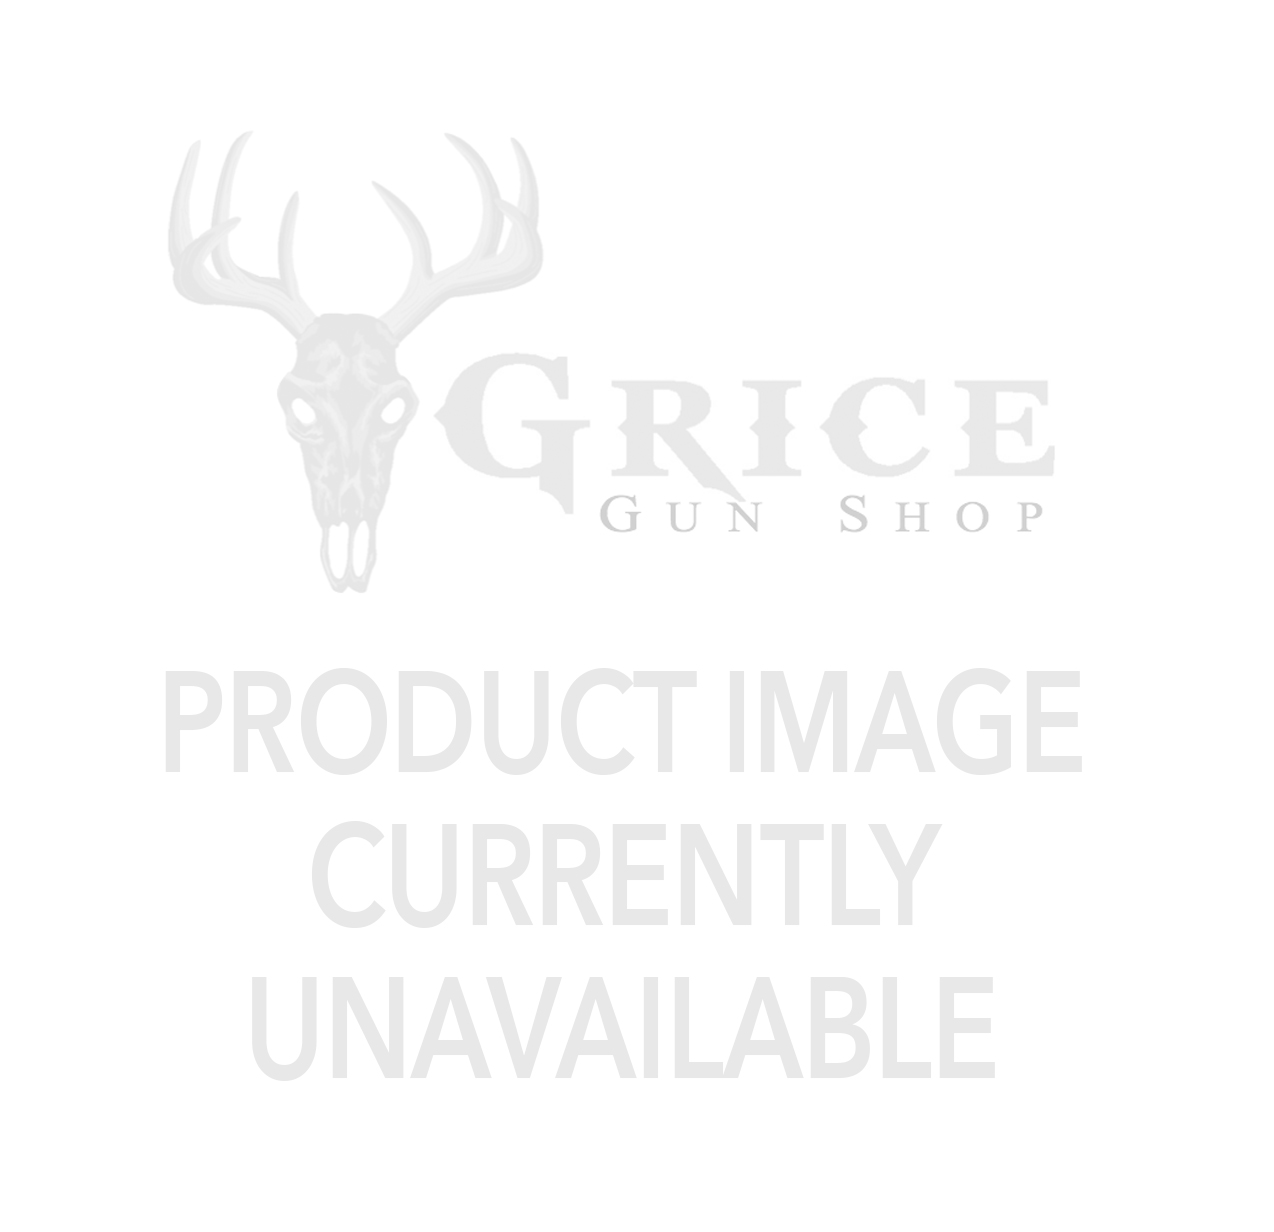 Legacy - Howa 1500 Southern Comfort Camo 308Win